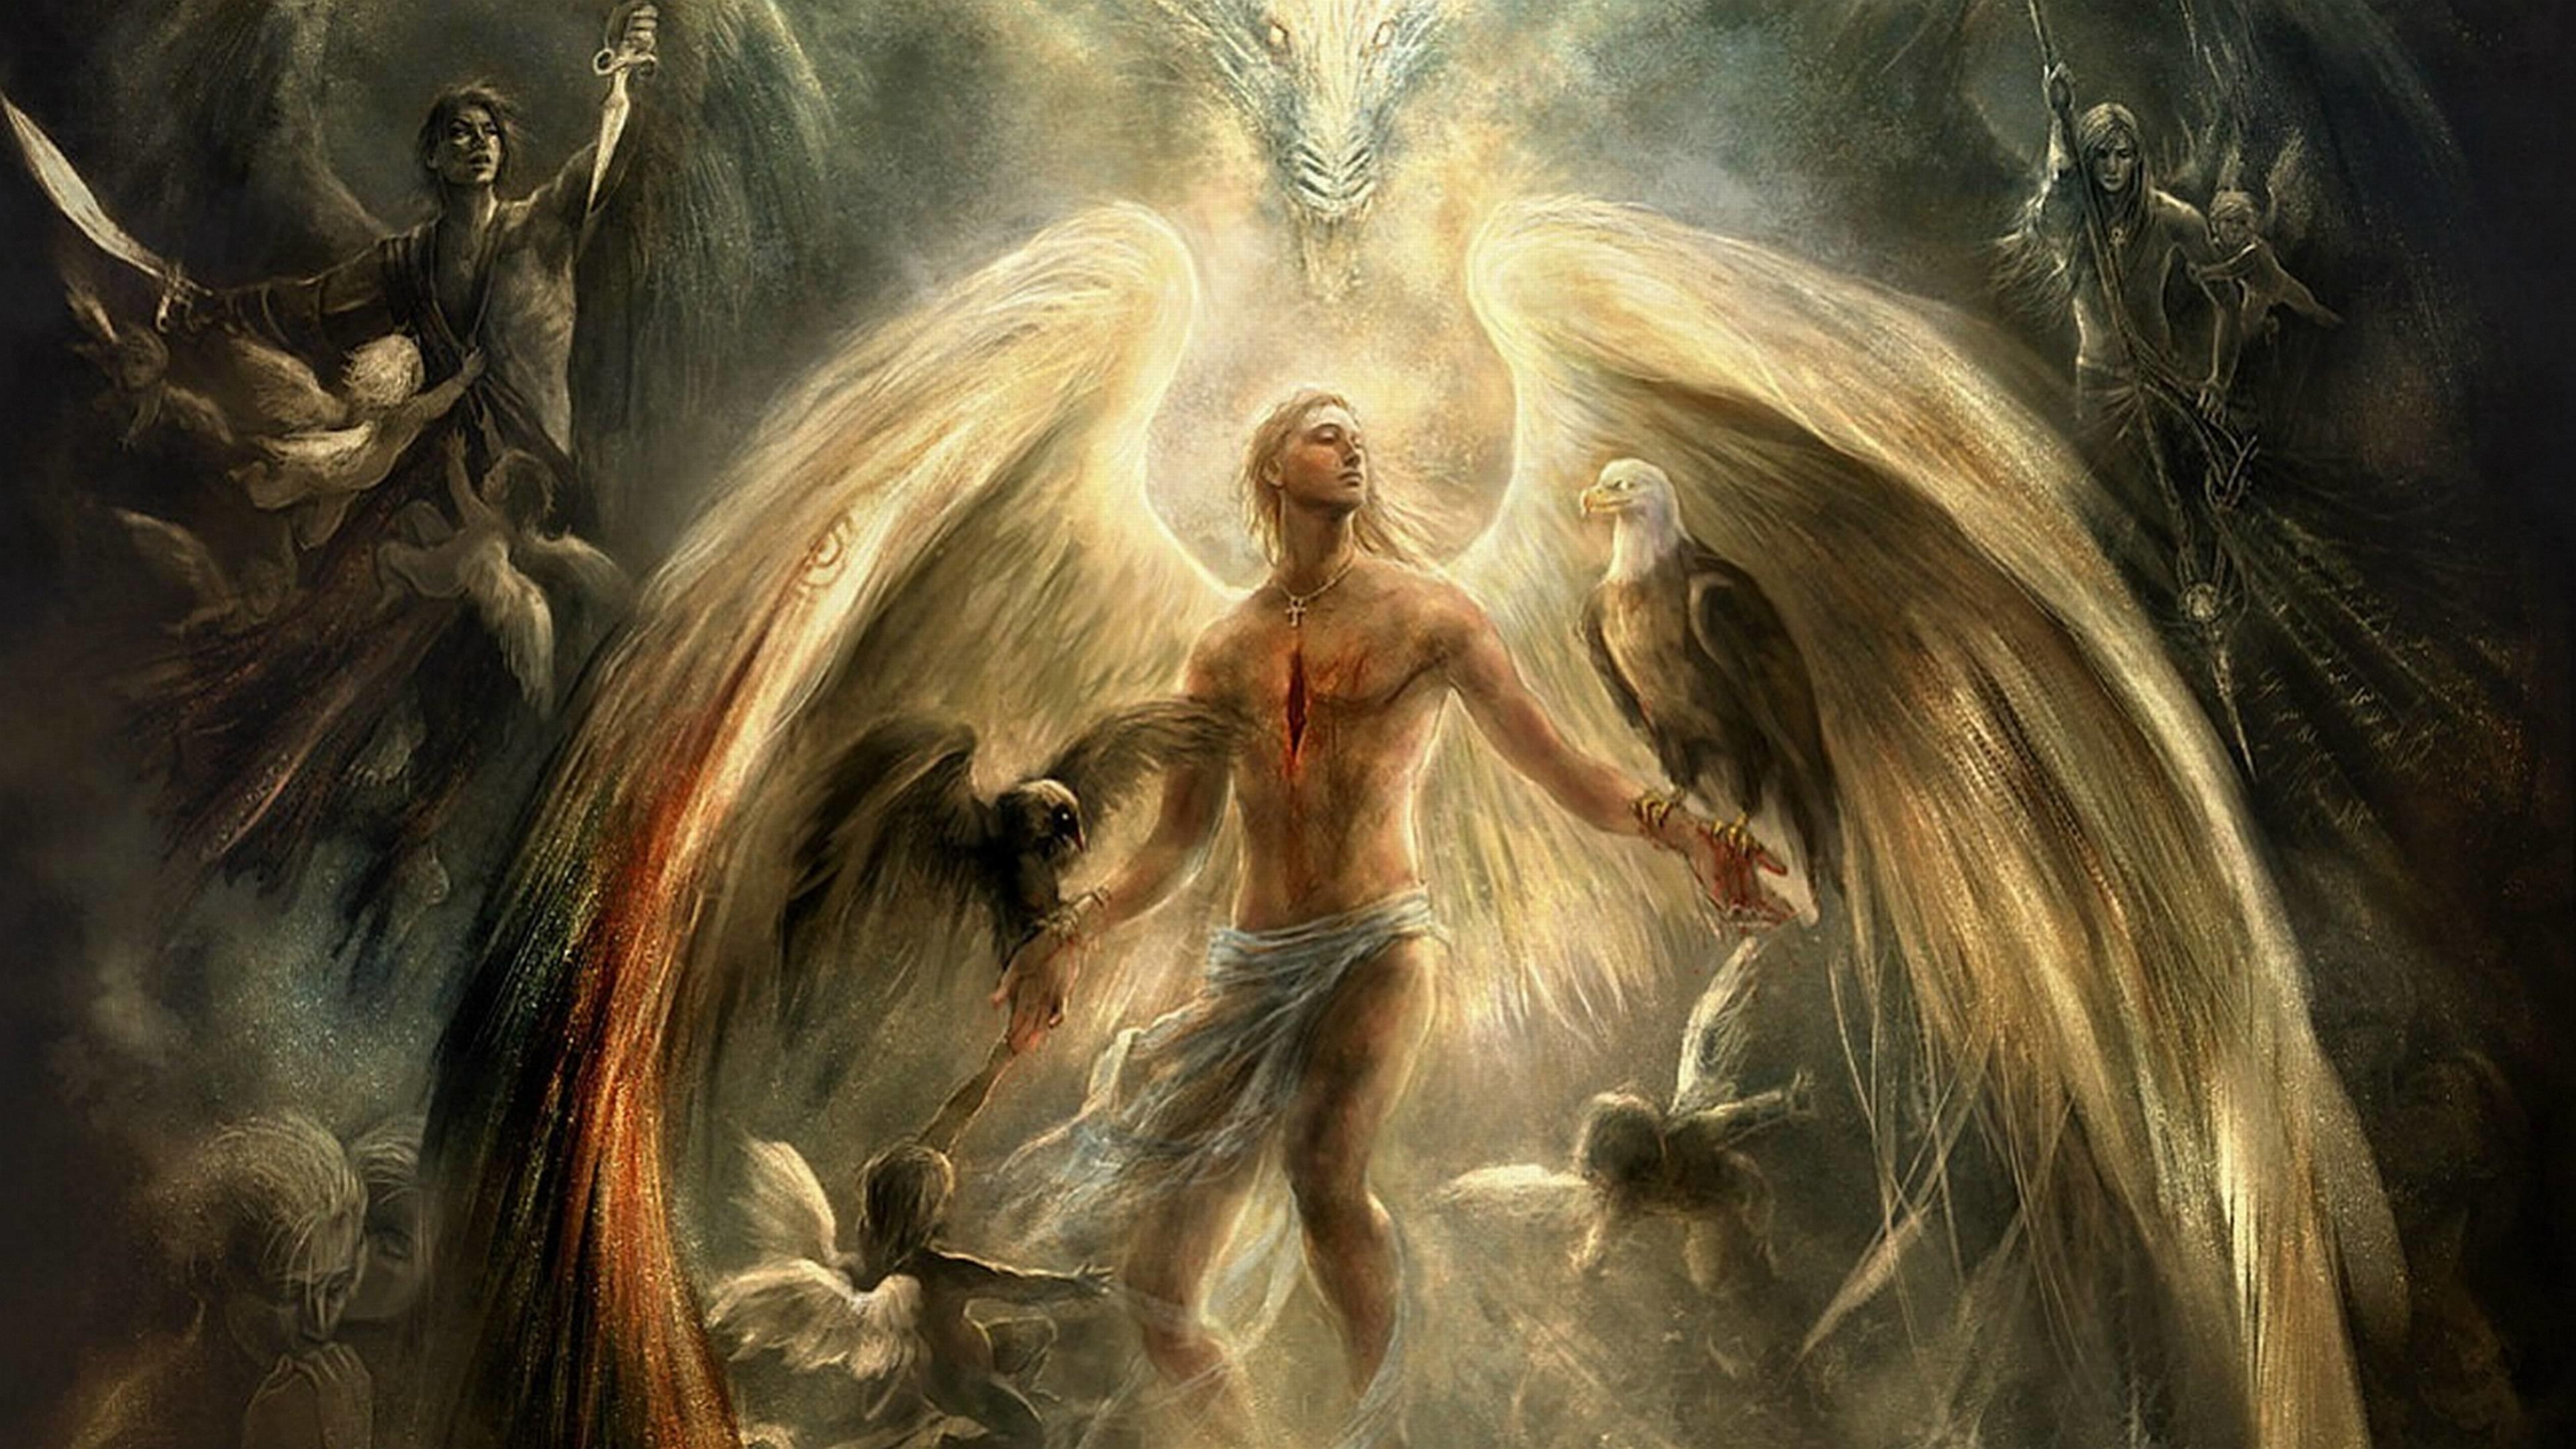 guardian angel wallpaper for